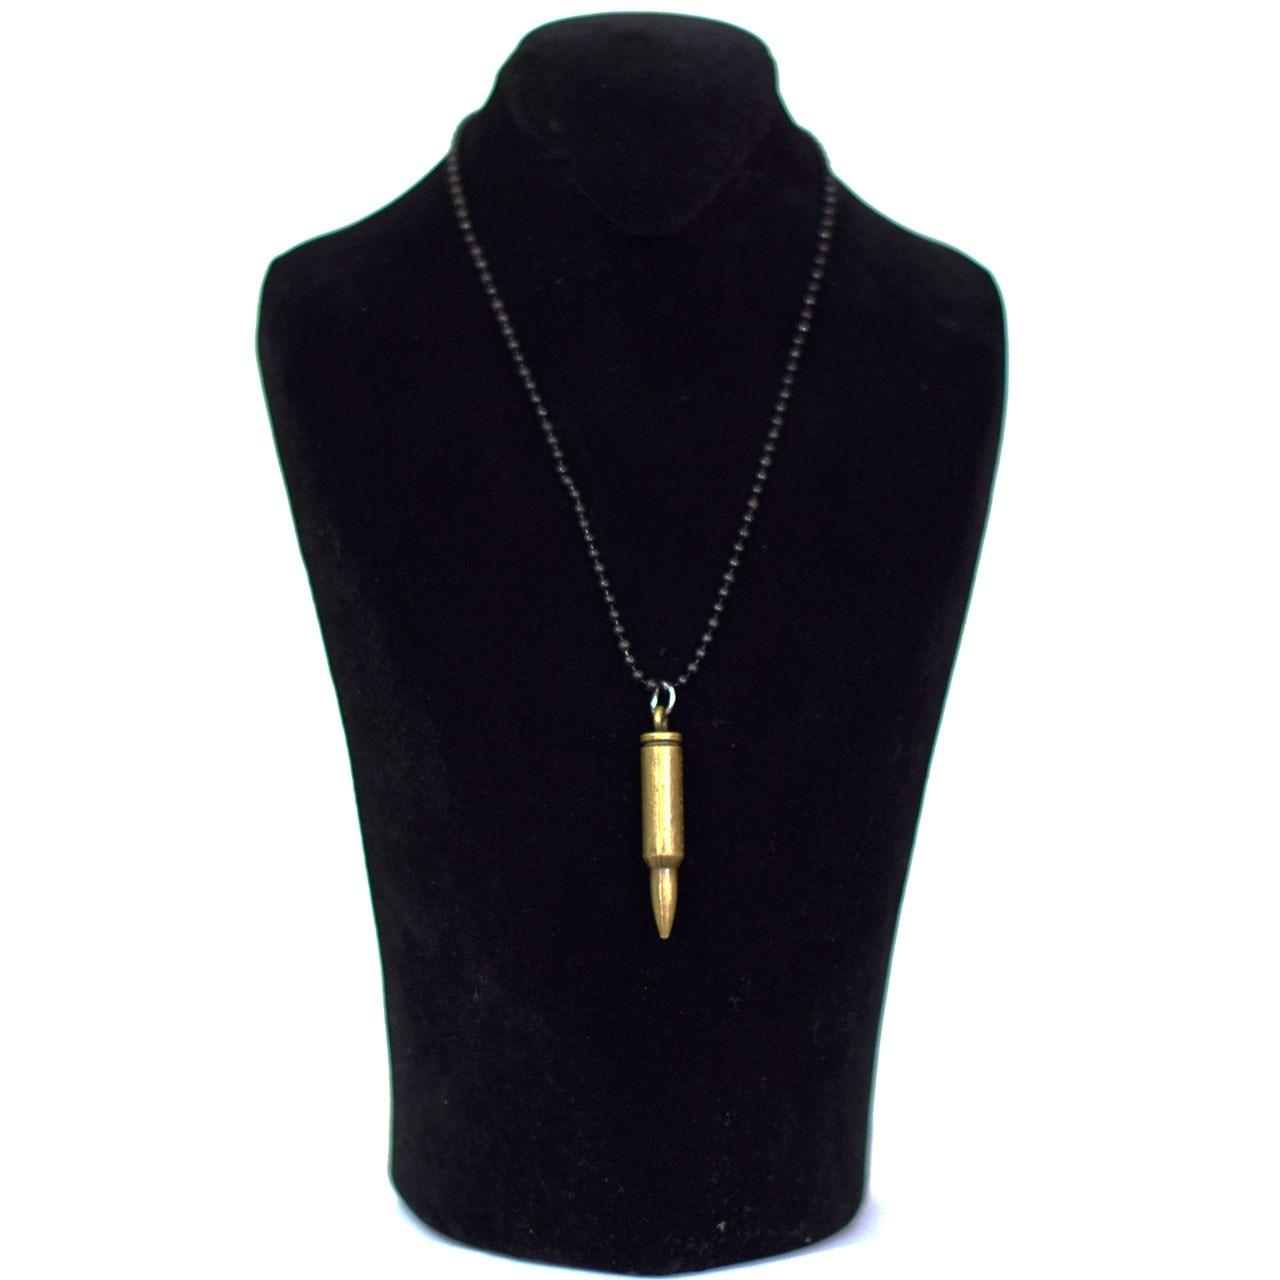 گردنبند ویولا مدل Magnum Bullet B02